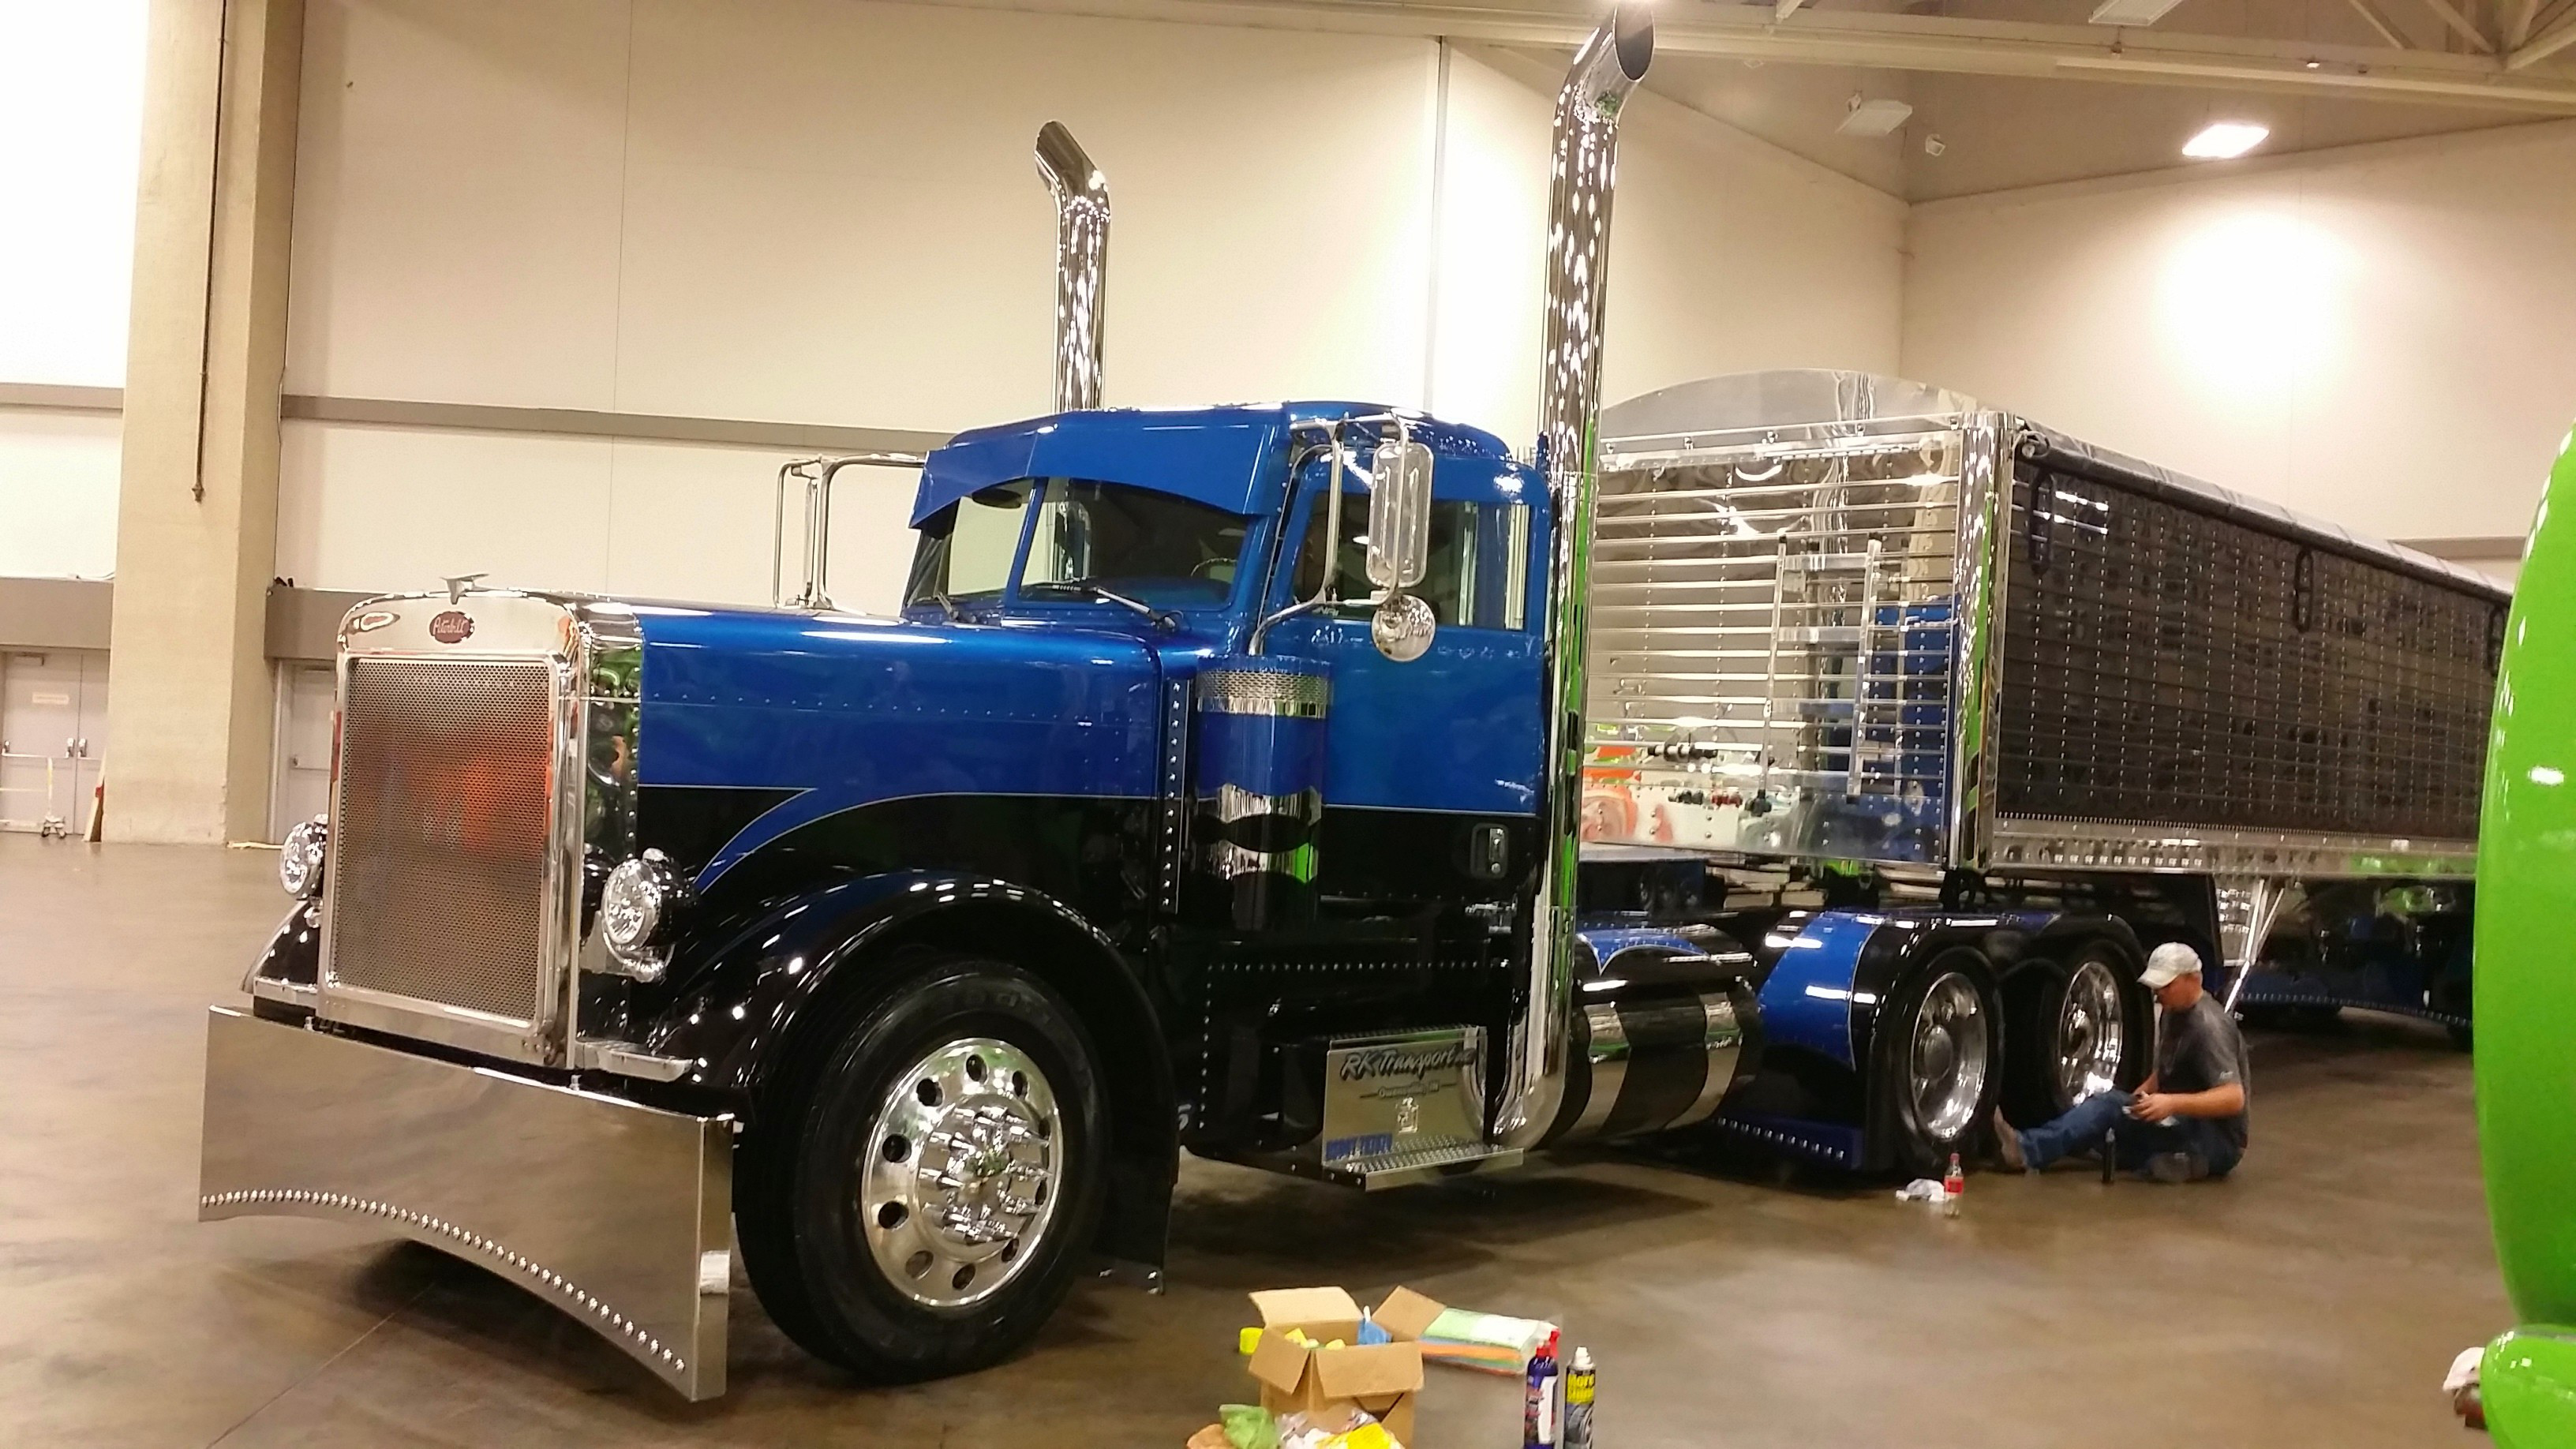 Davis' truck